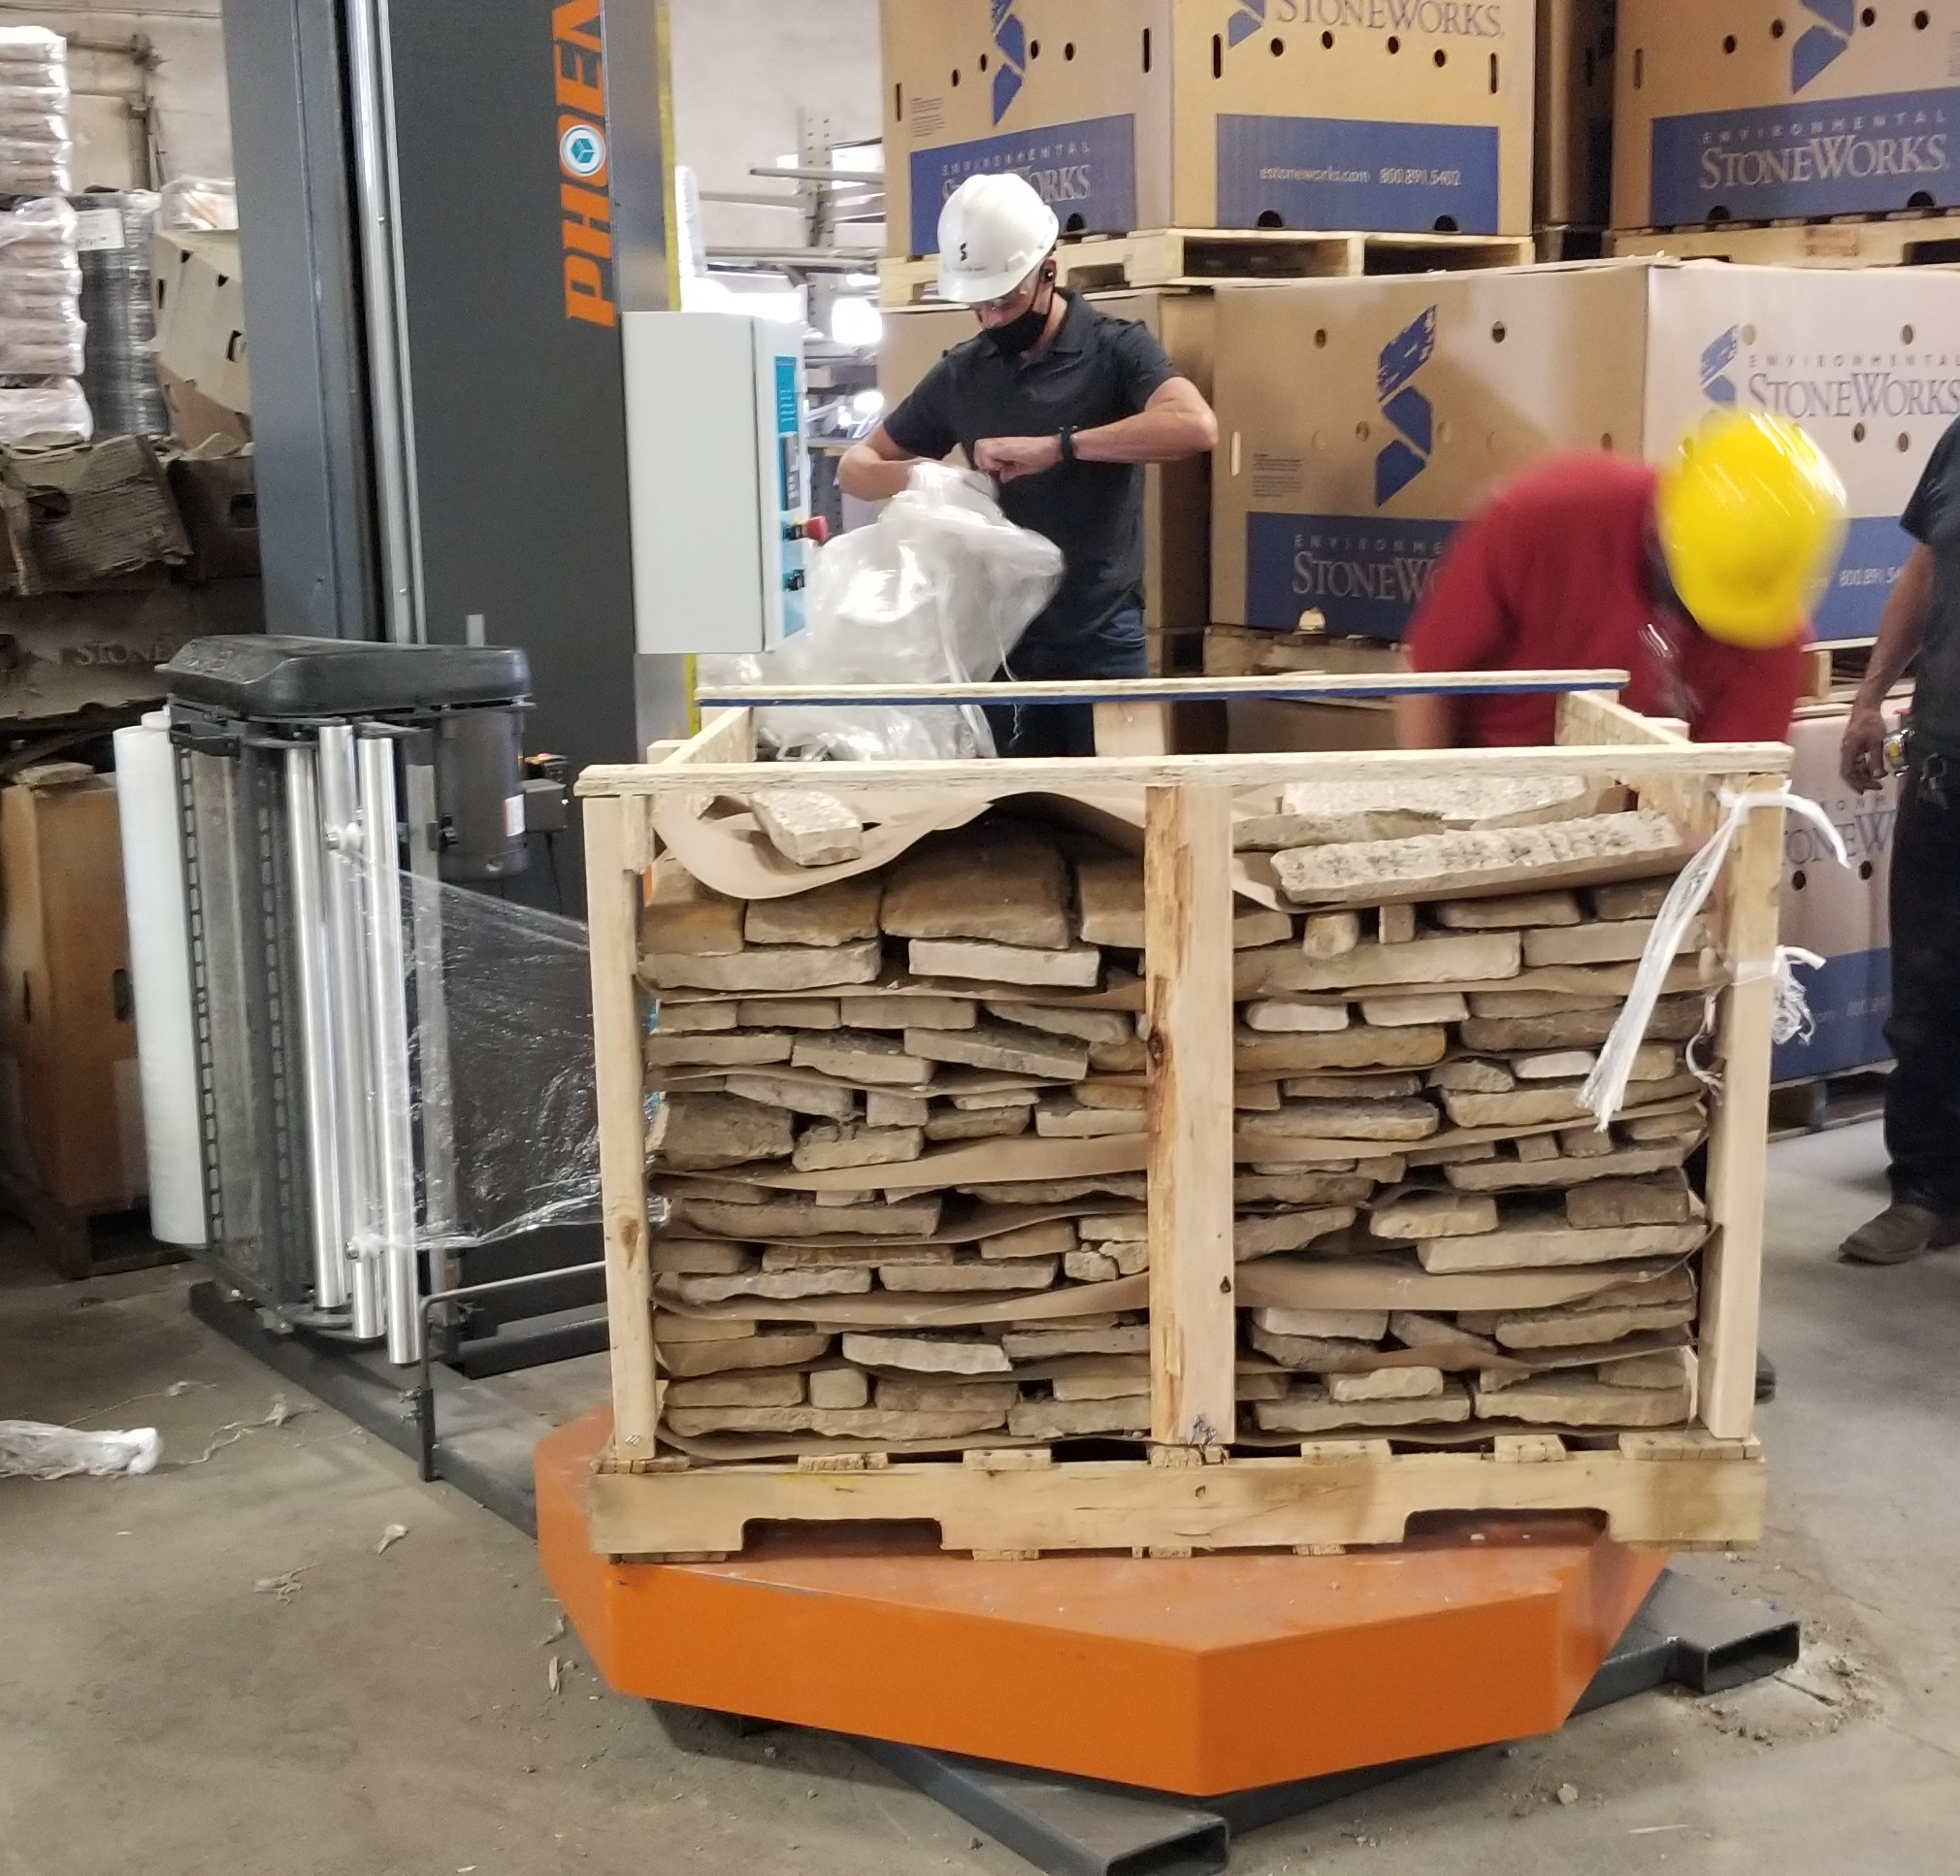 Forklift Loaded High Profile Pallet Wrapper For Stone